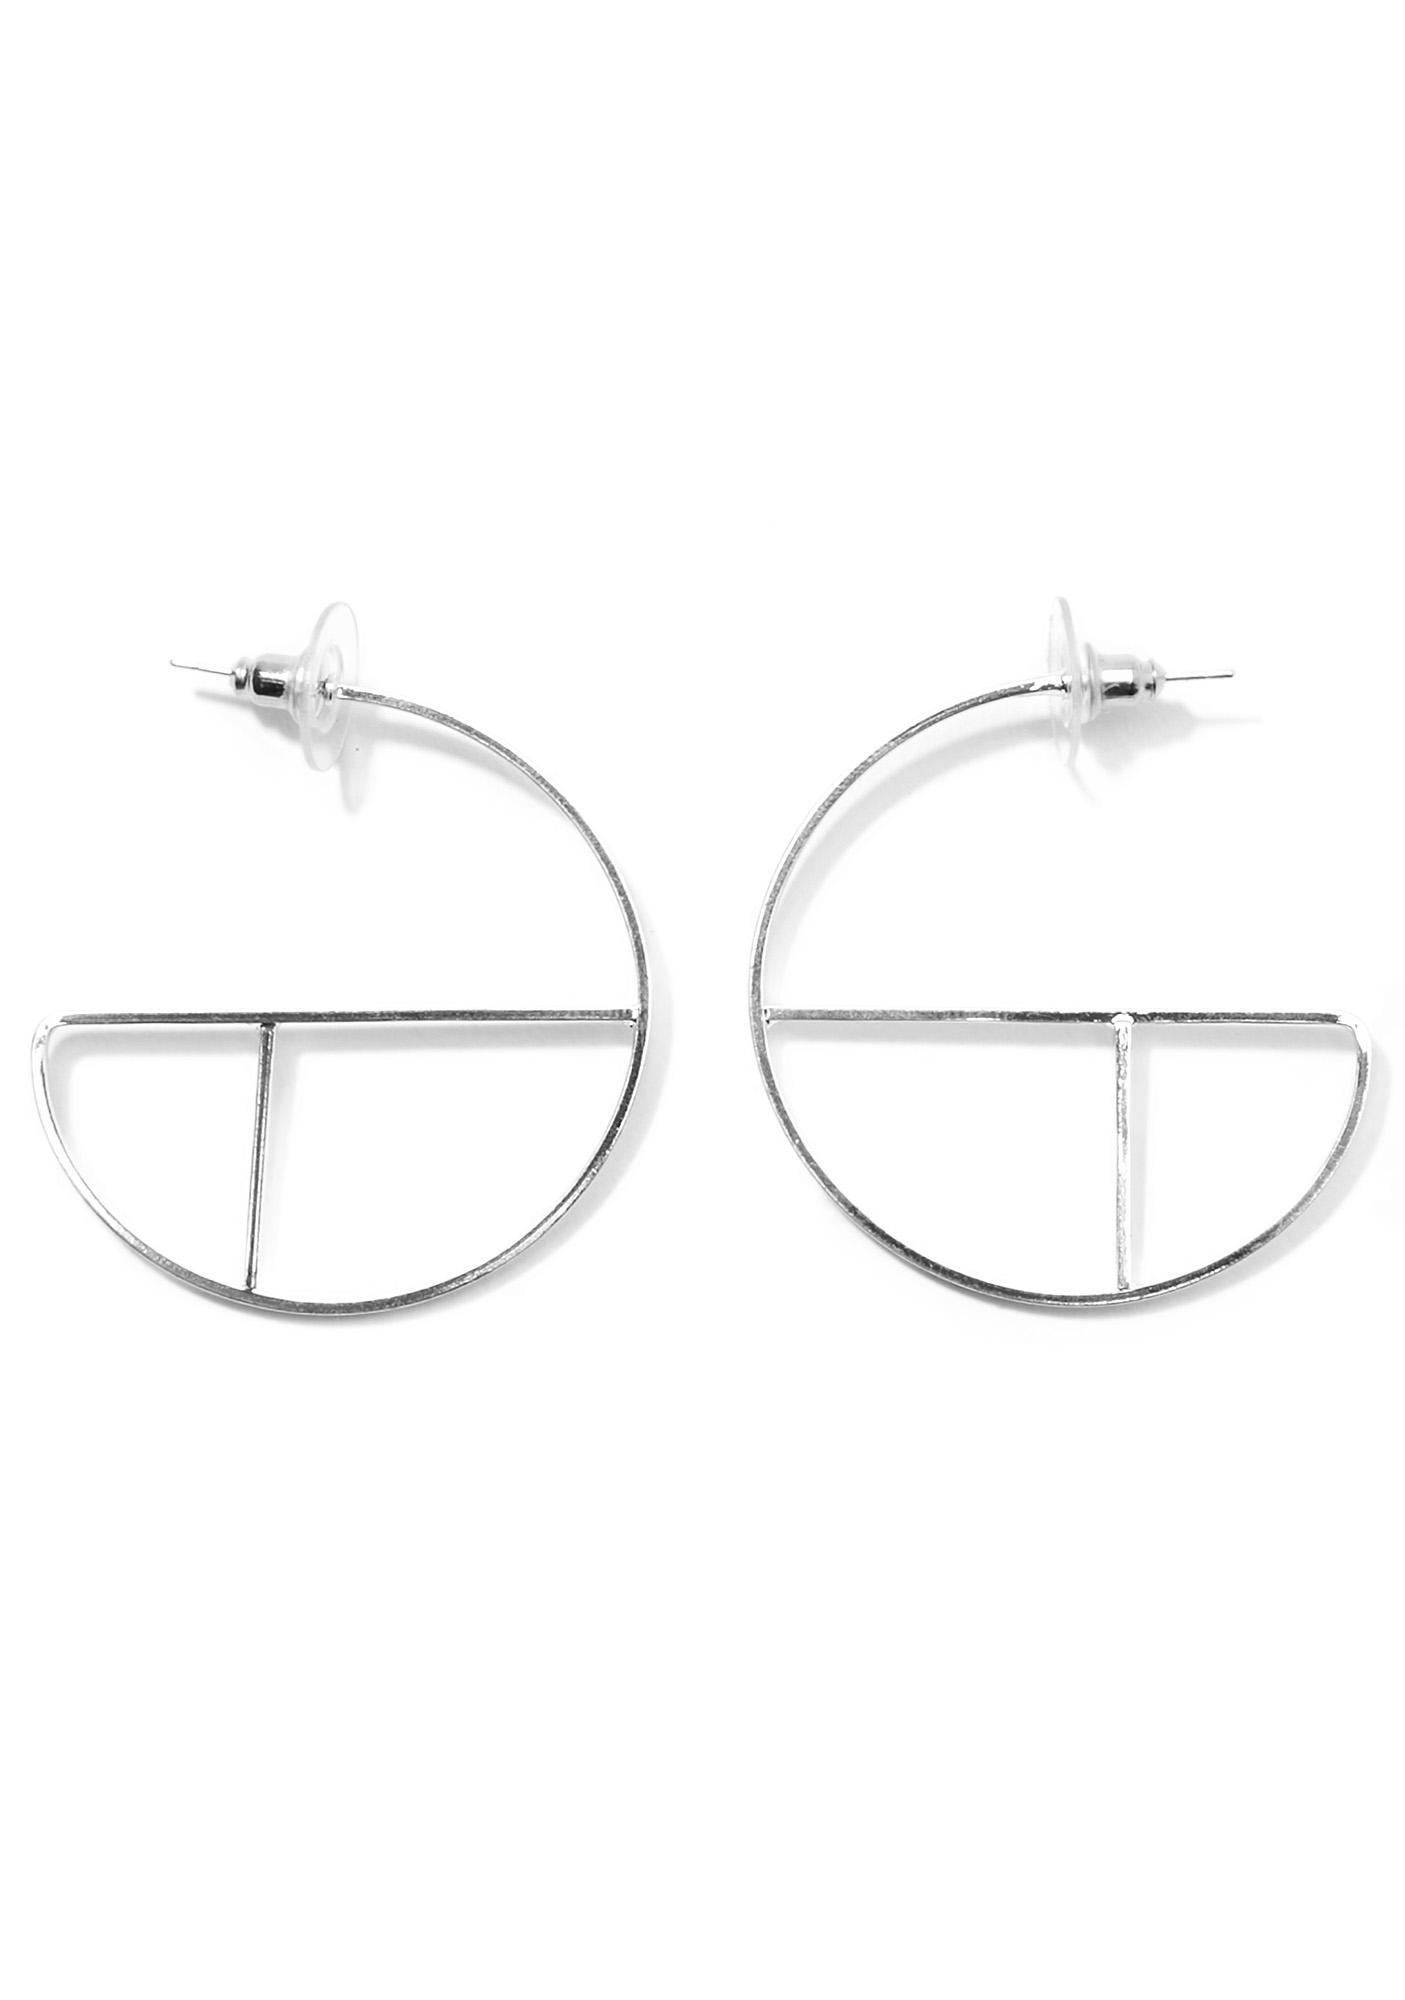 Turn Around Silver Geometric Hoops